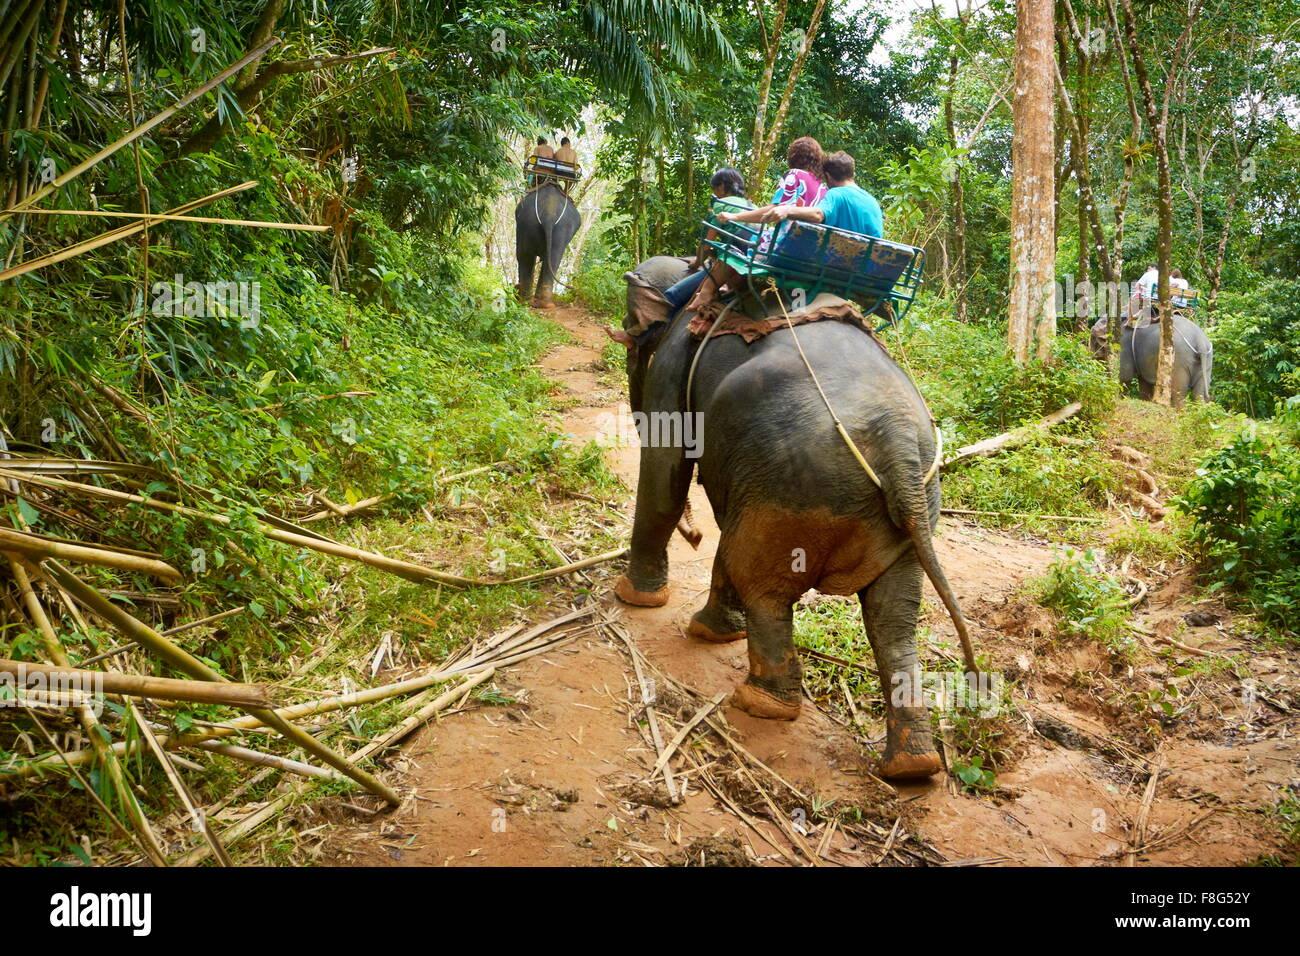 Thailand - Khao Lak National Park, elephant riding in tropical jungle - Stock Image